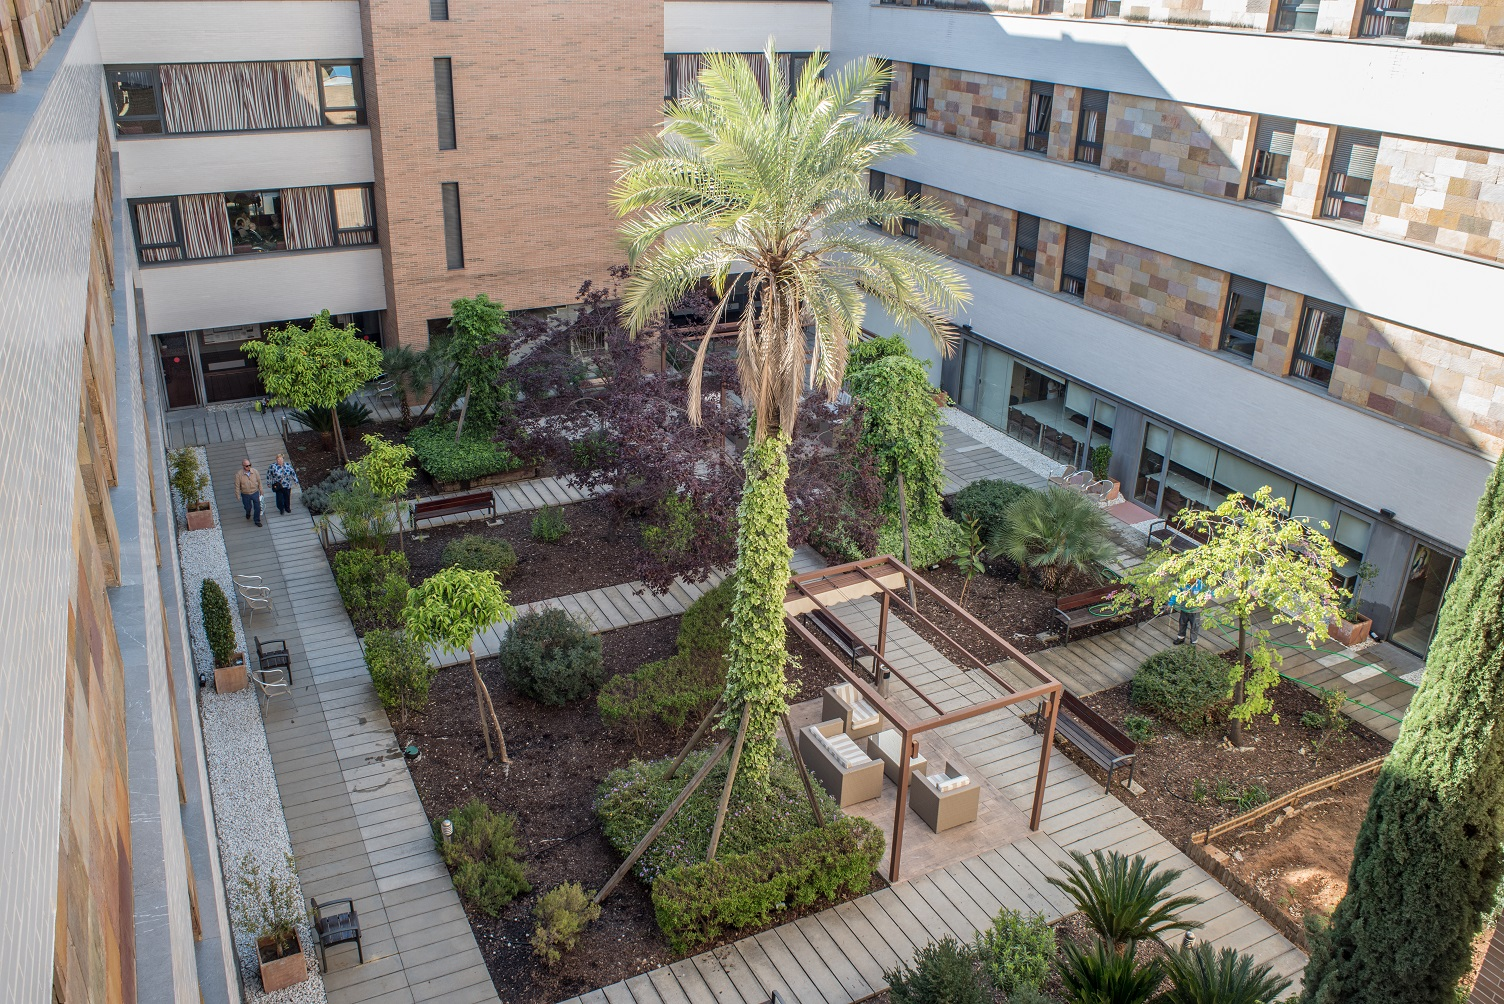 Residencia para mayores Santa Justa, Sevilla